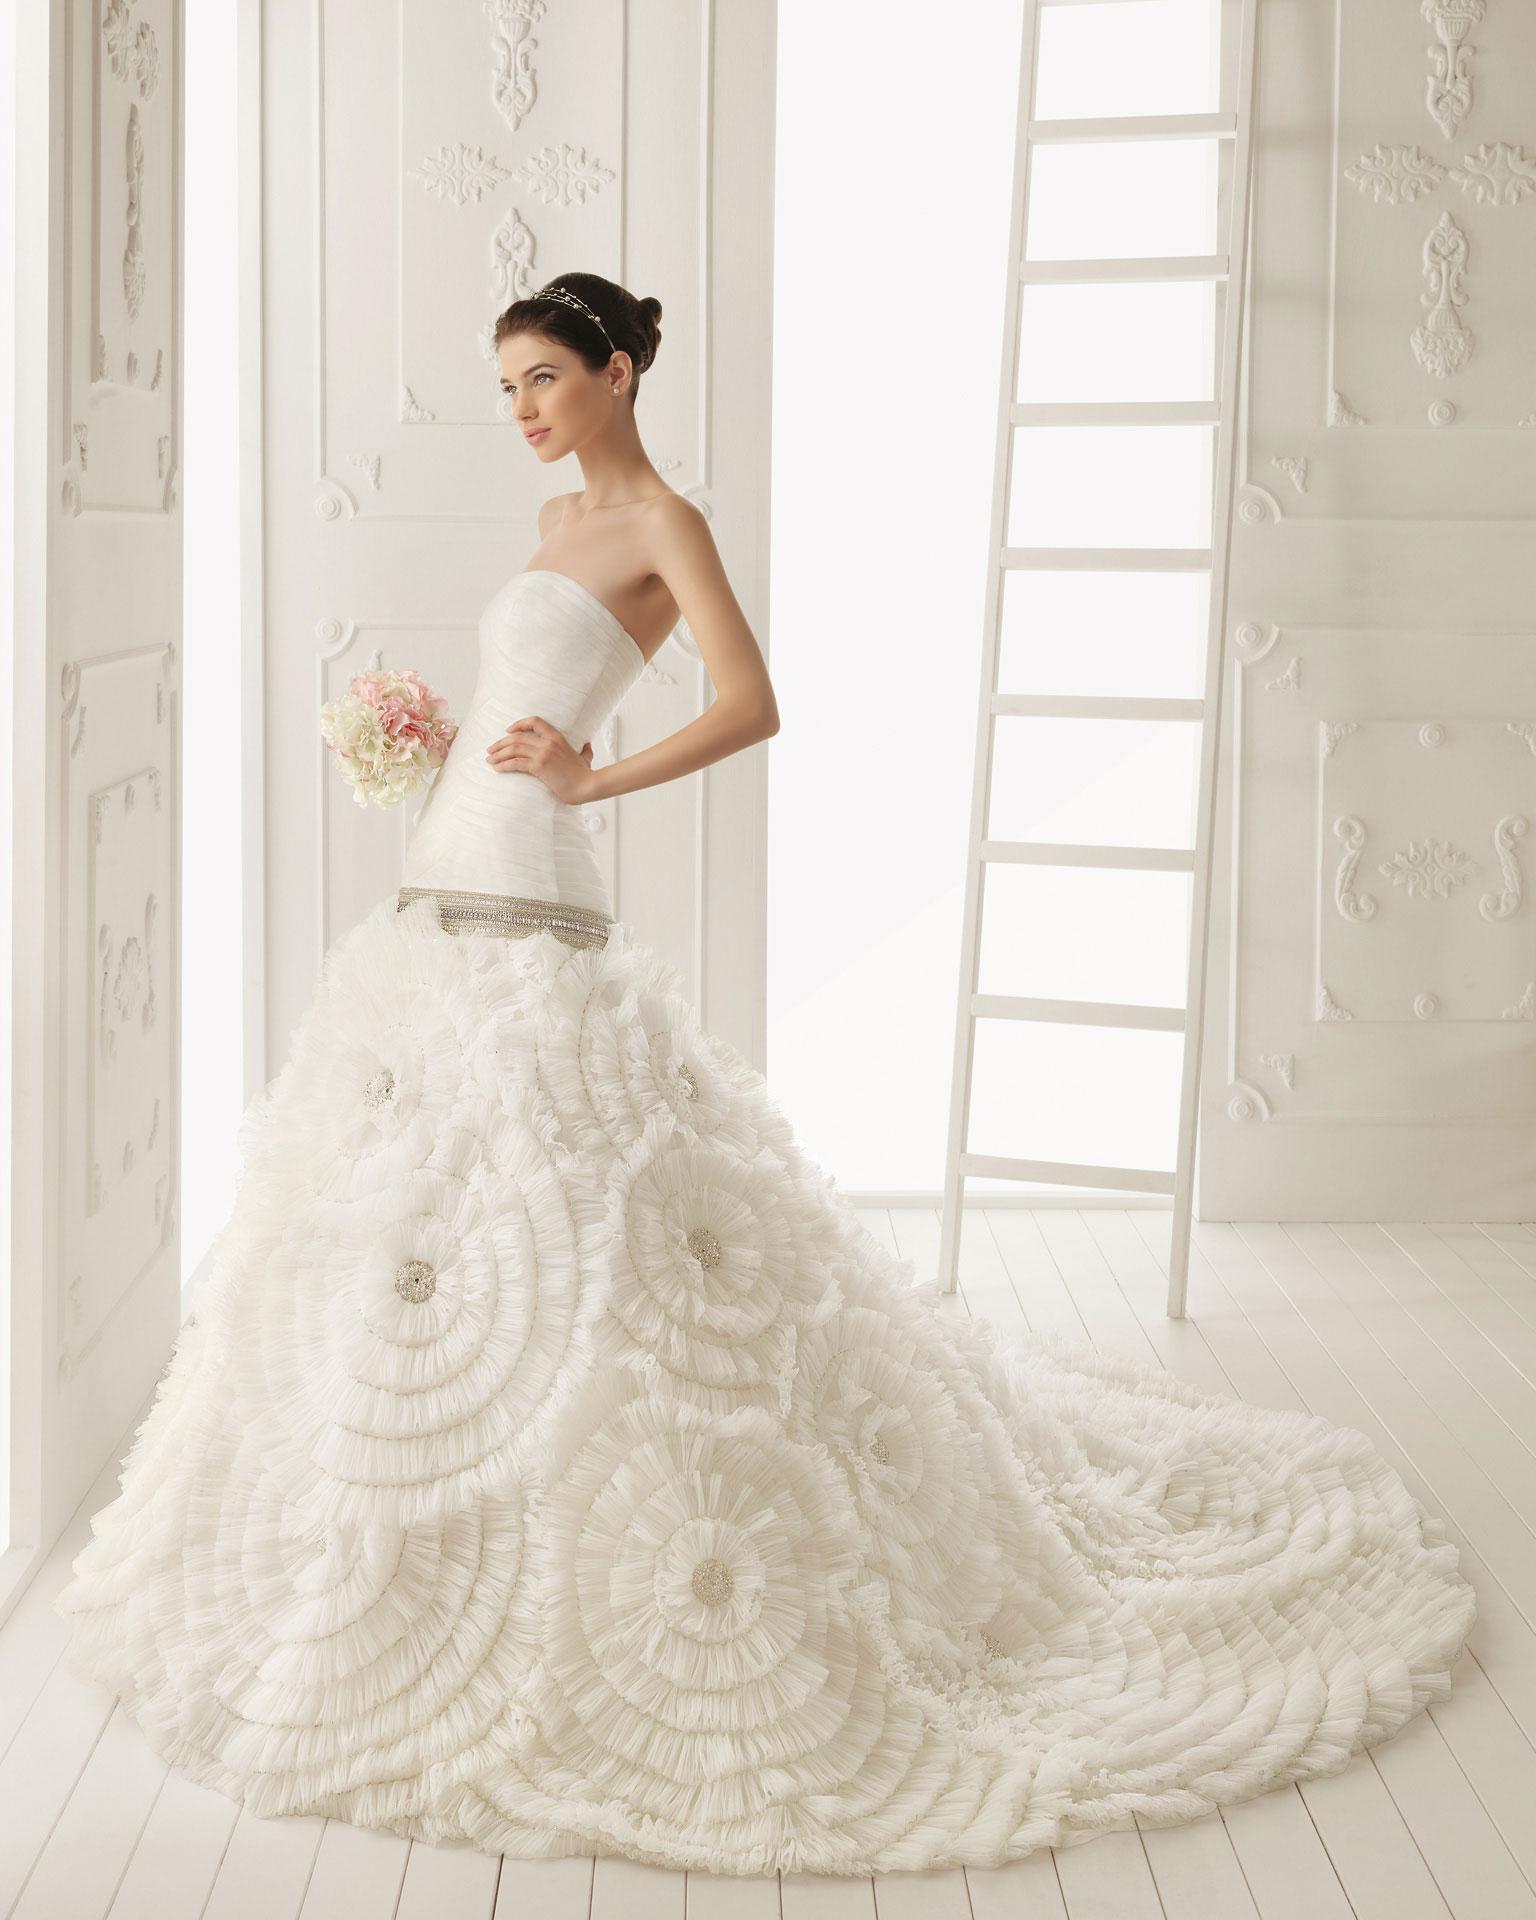 2013 wedding dress aire barcelona bridal gowns rosana for Wedding dresses in barcelona spain